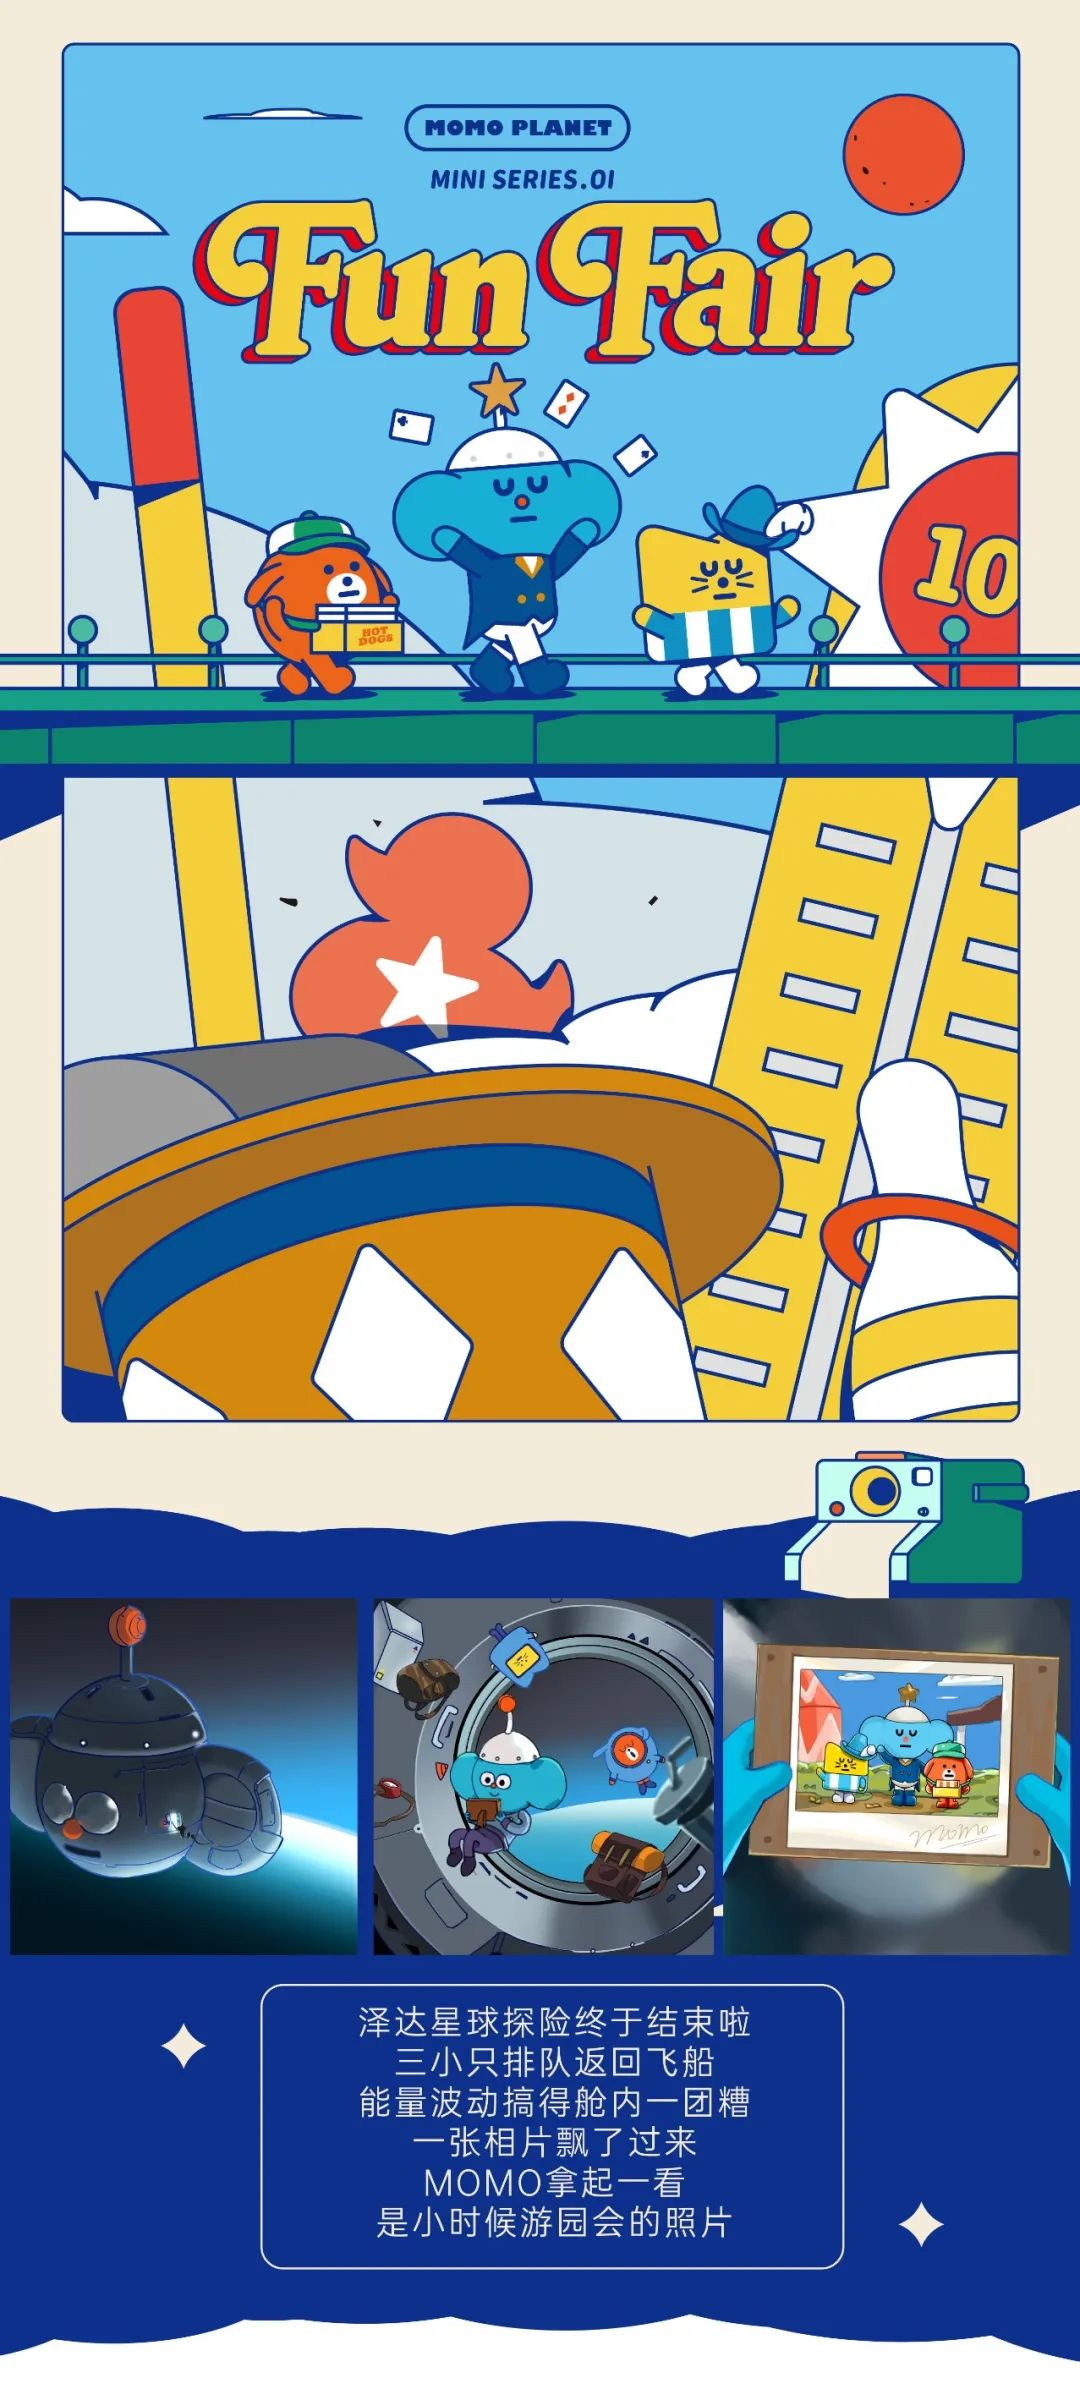 「MOMO PLANET」M.01 MINI系列盲盒第一季「FUN FAIR   游园会」正式发布